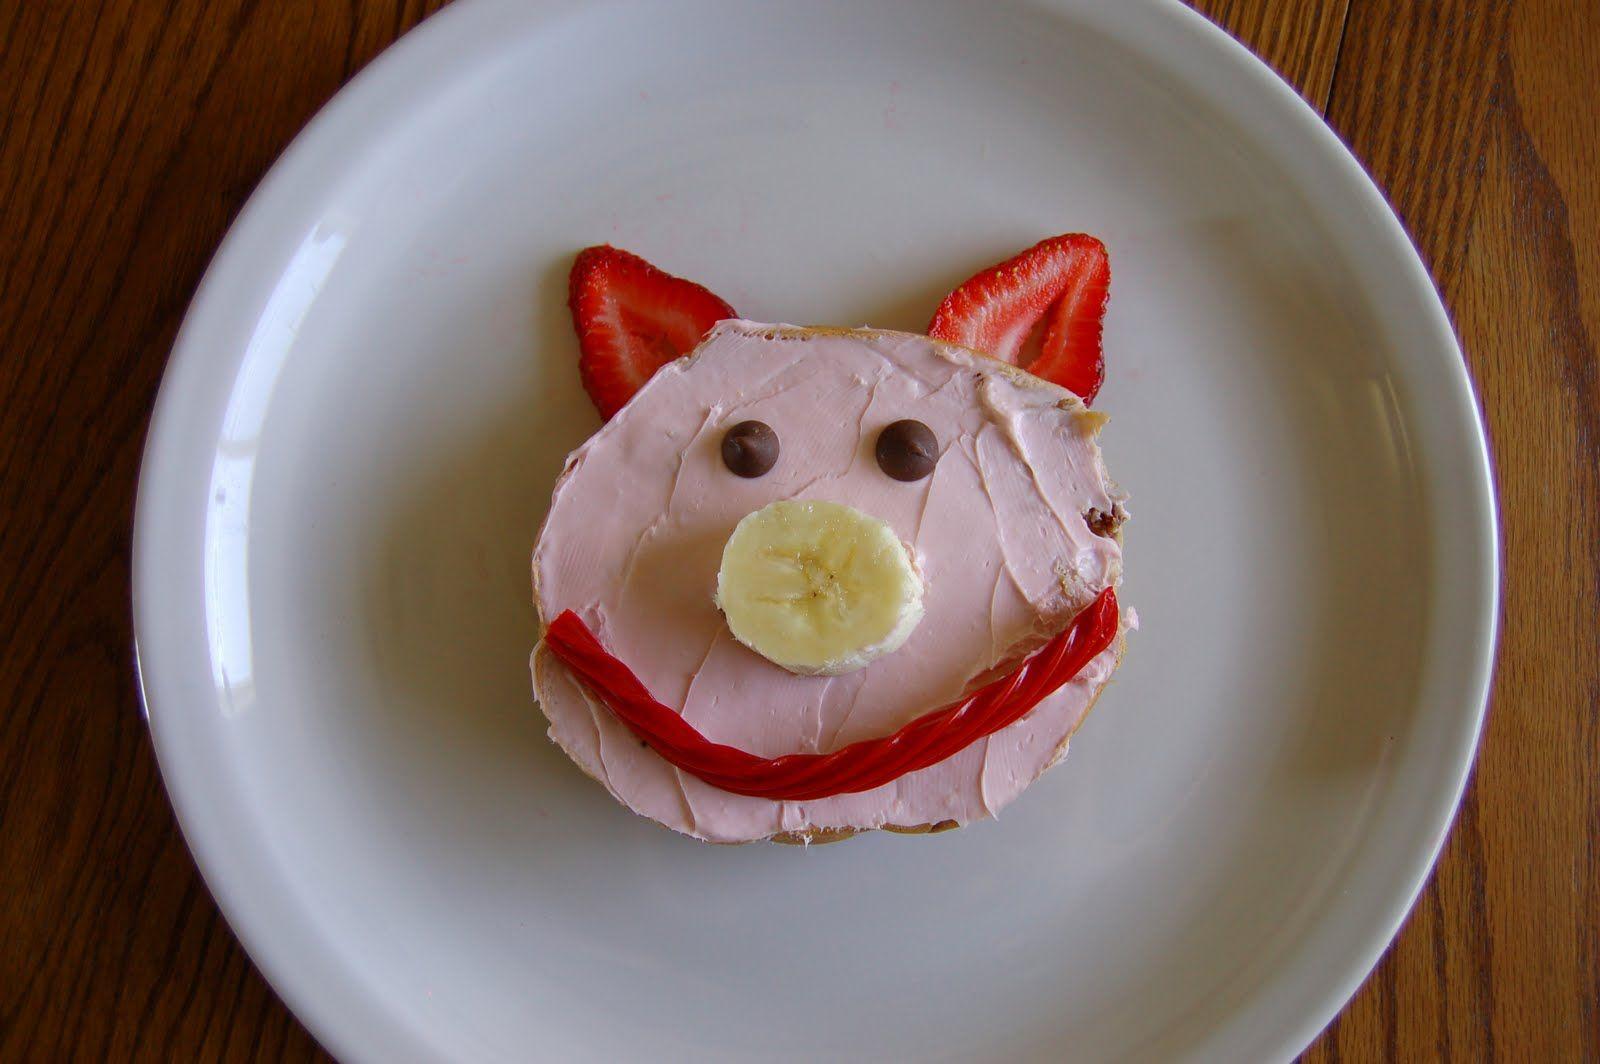 Piggy Snack To Go With Piggies Story Time